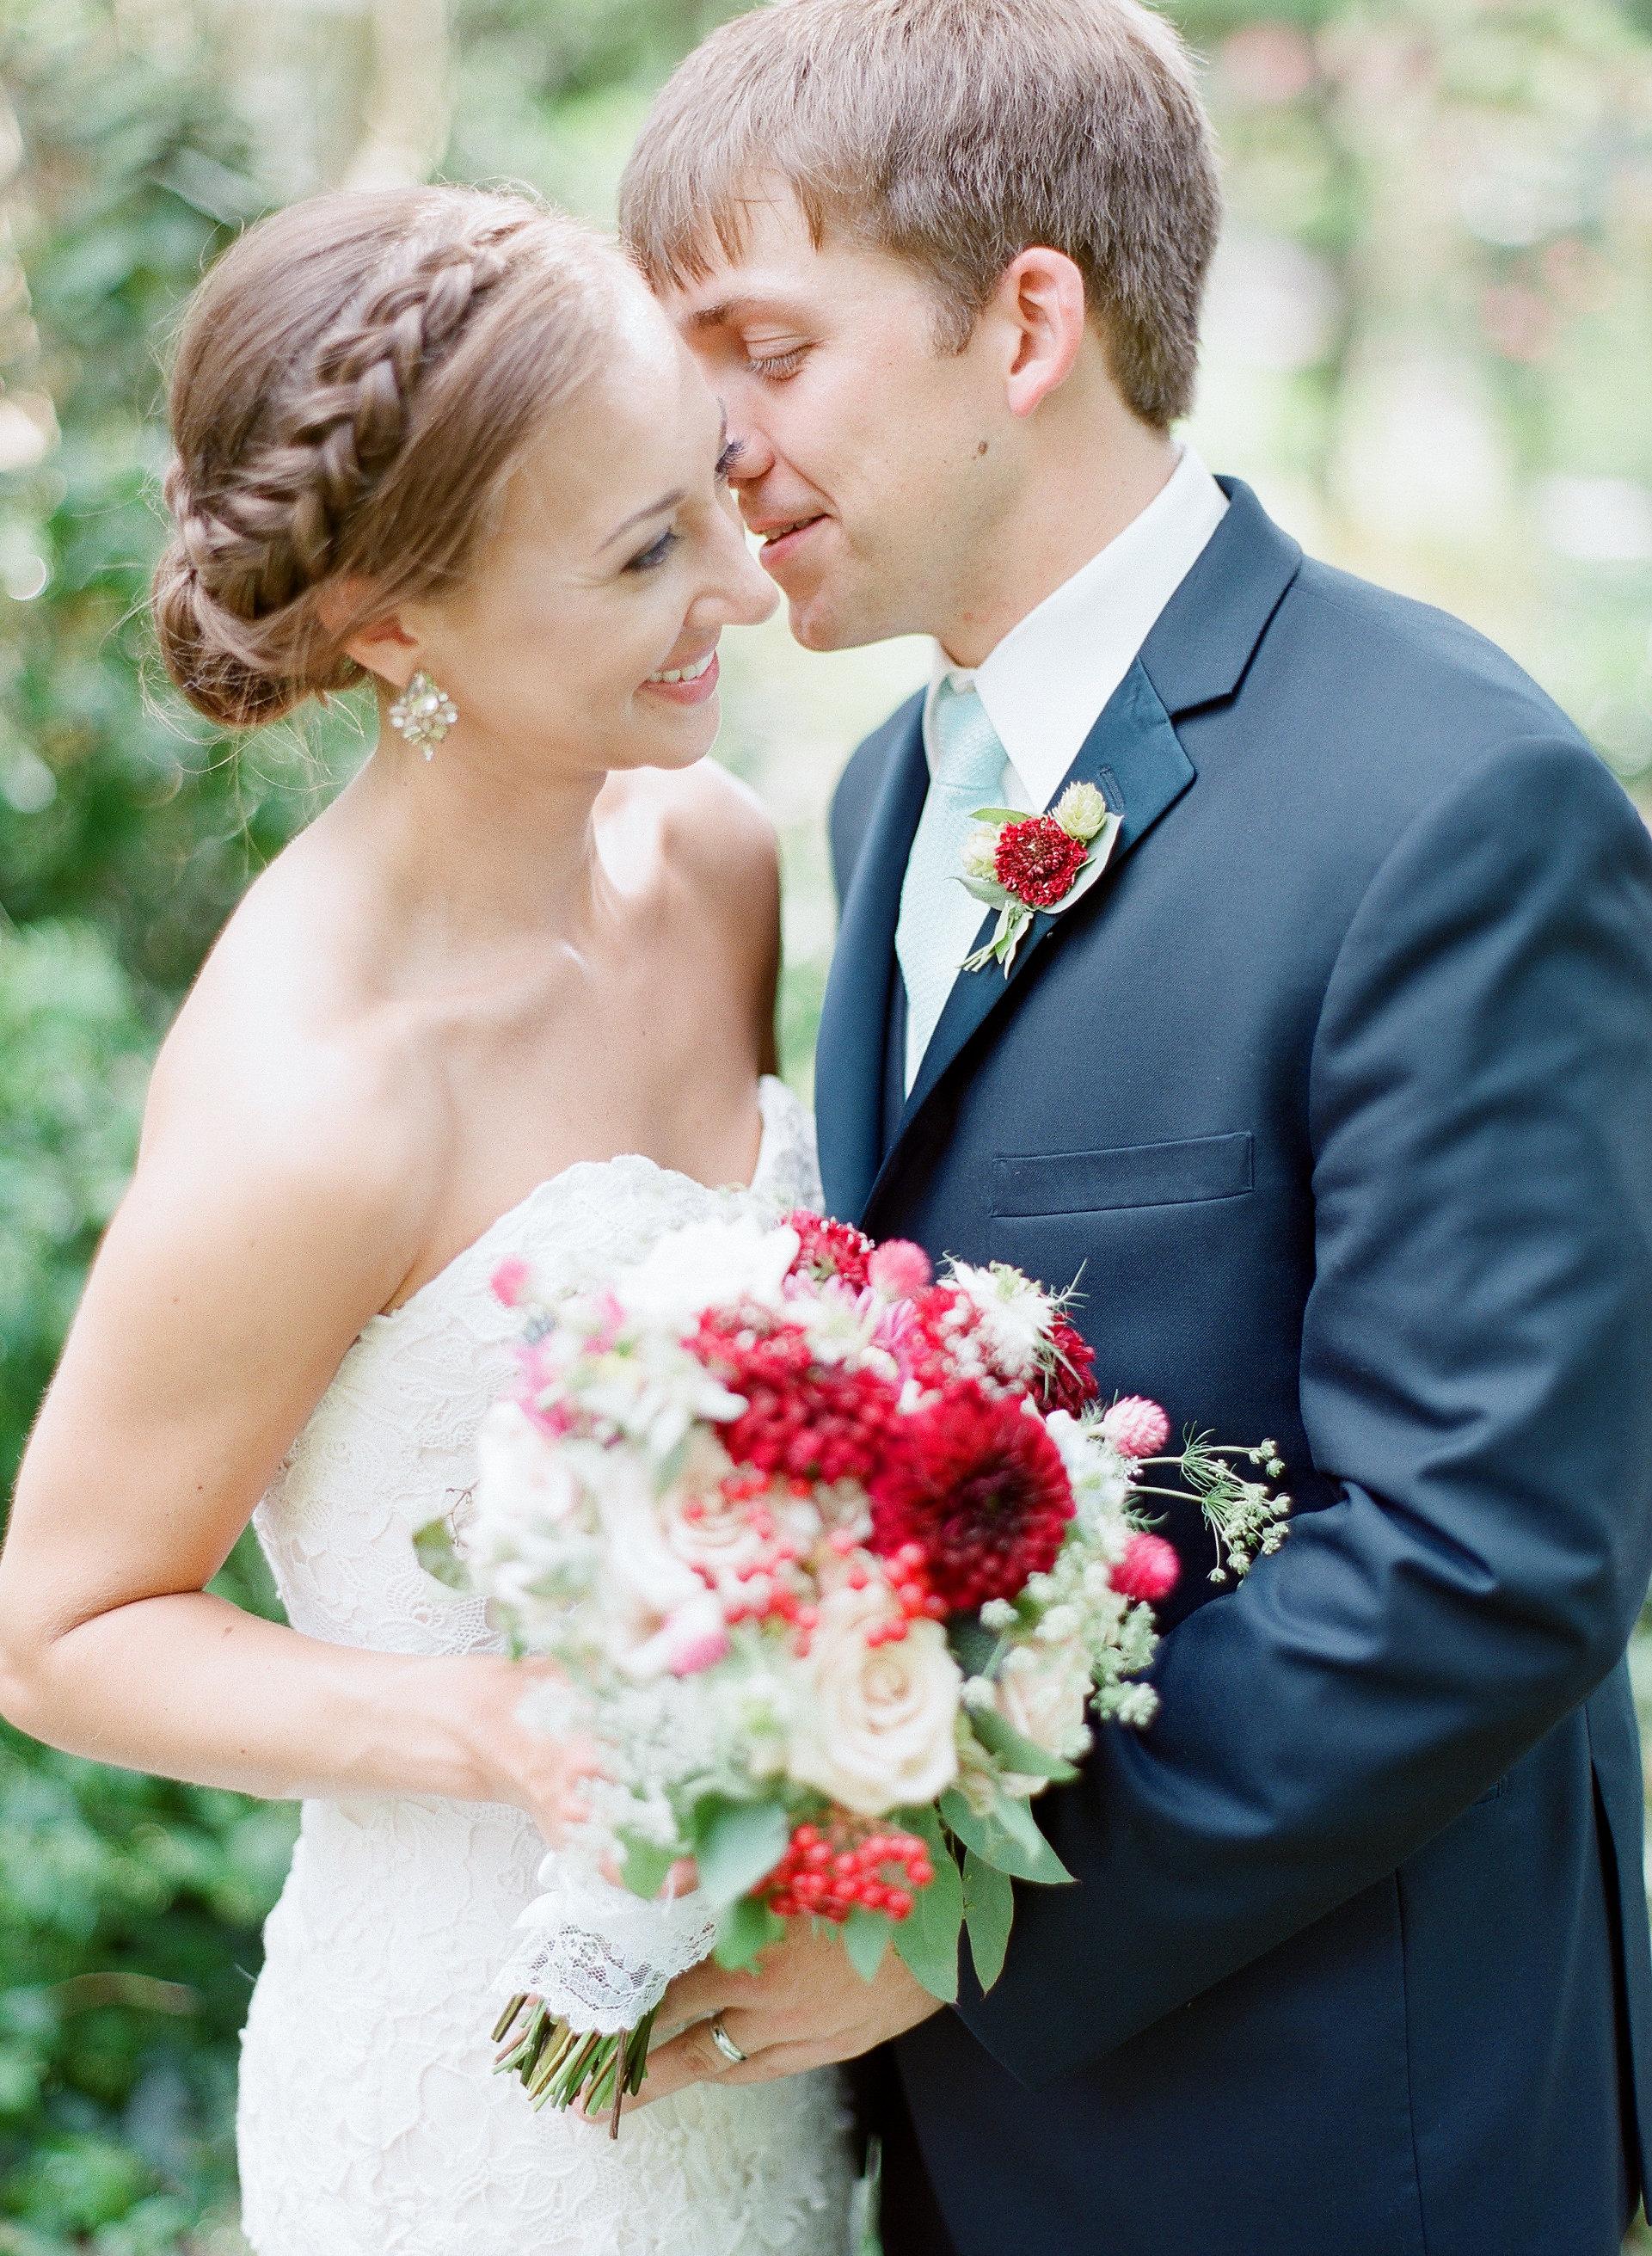 photography: markandrewstudios.com